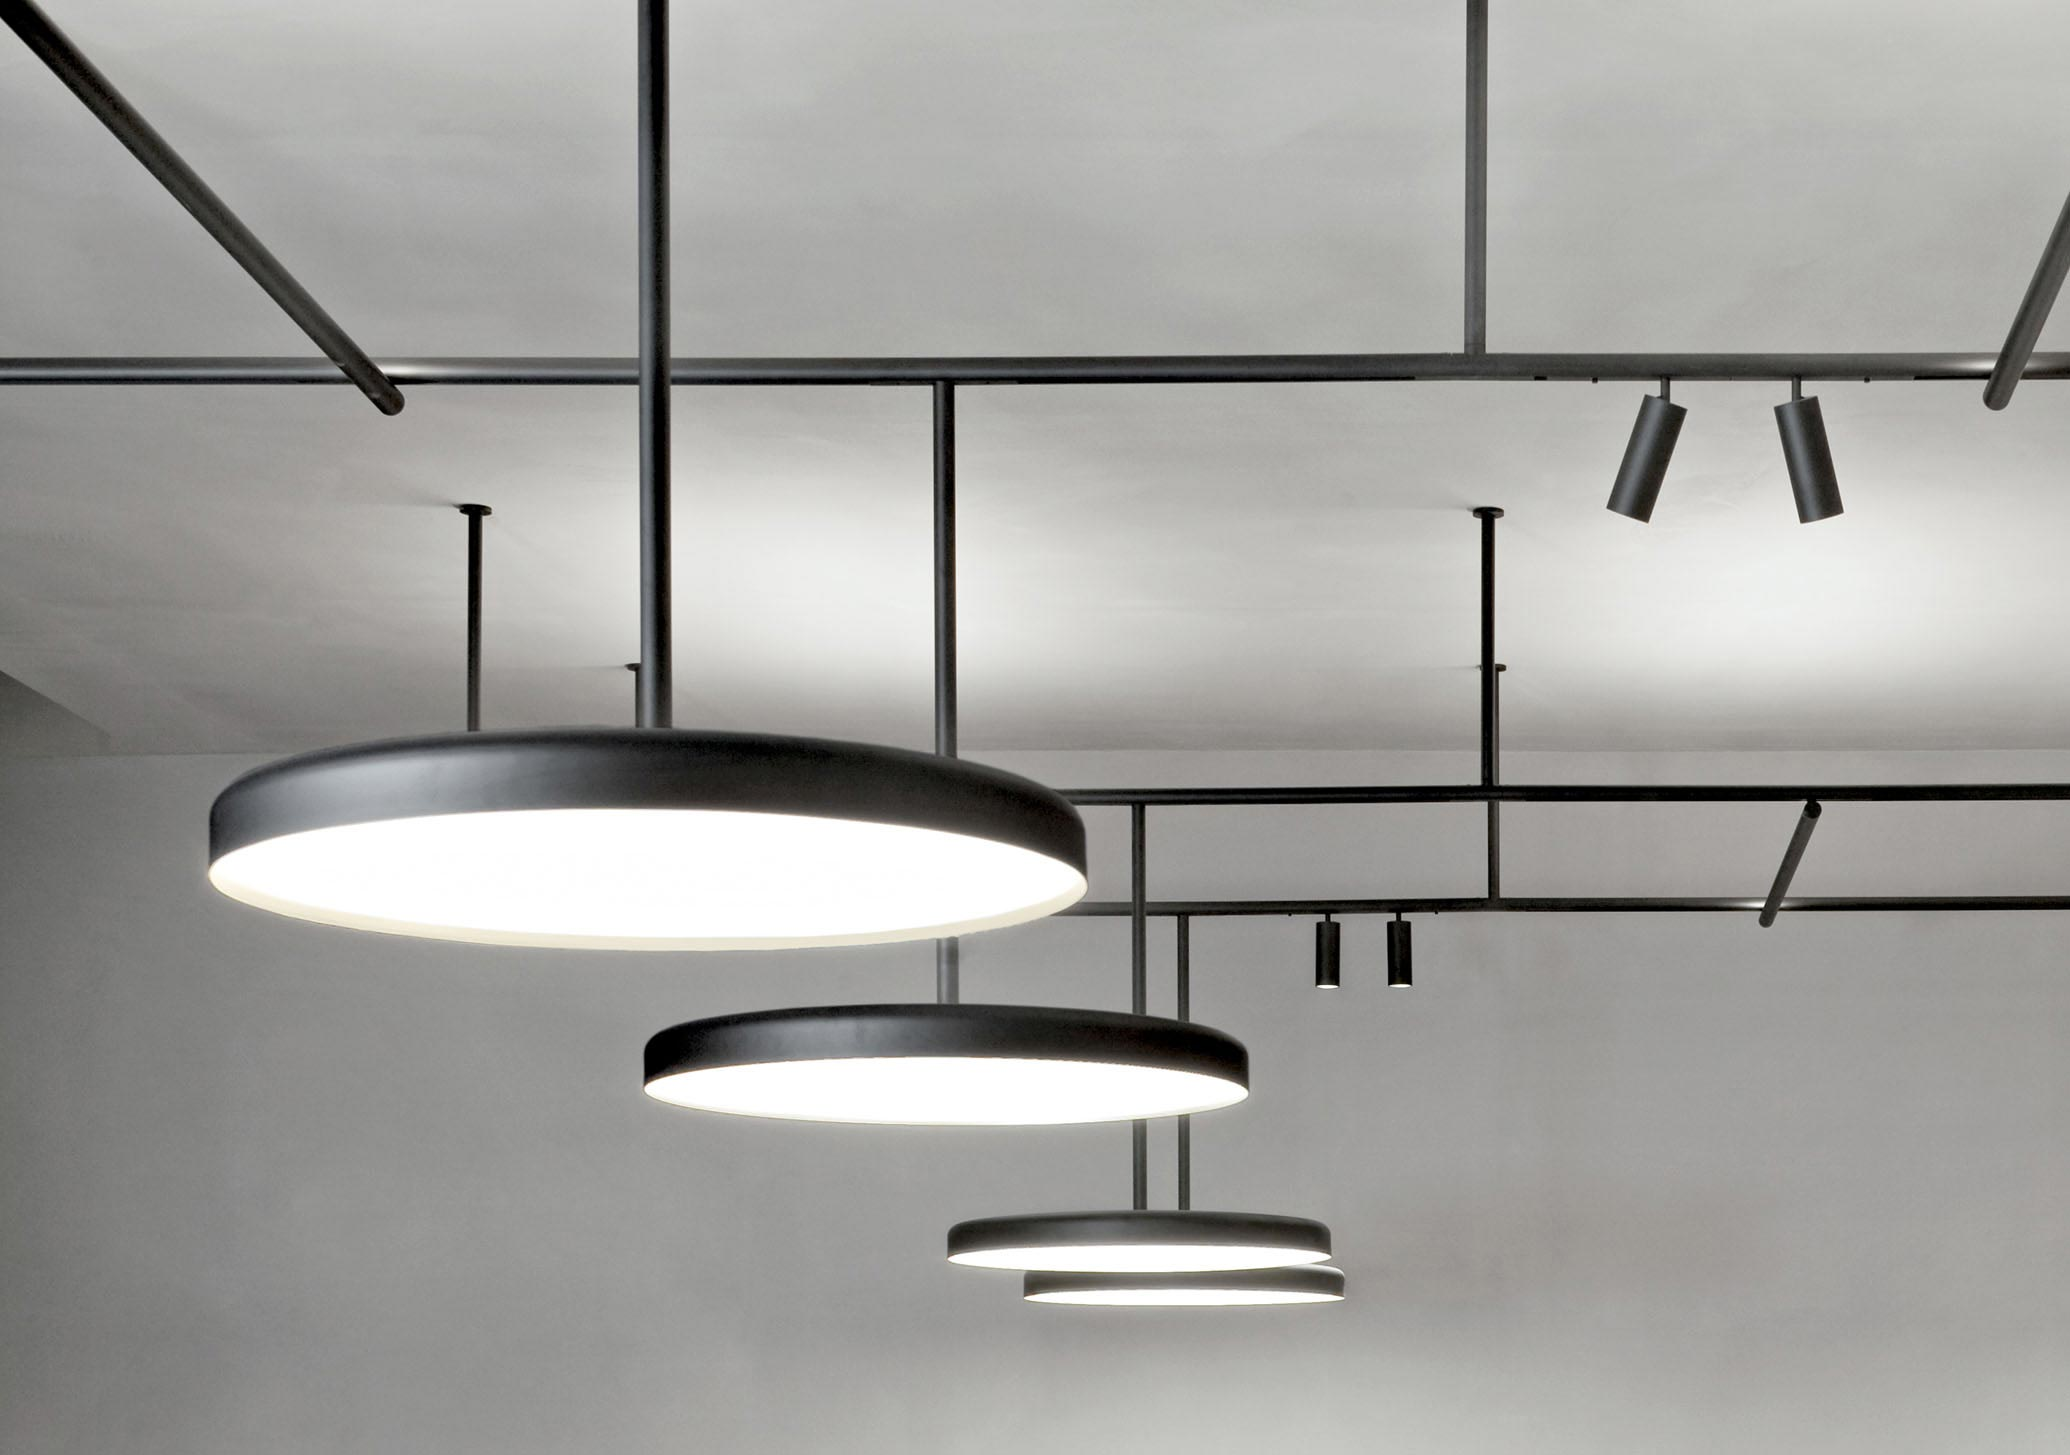 luminaire suspension infra-structure flos